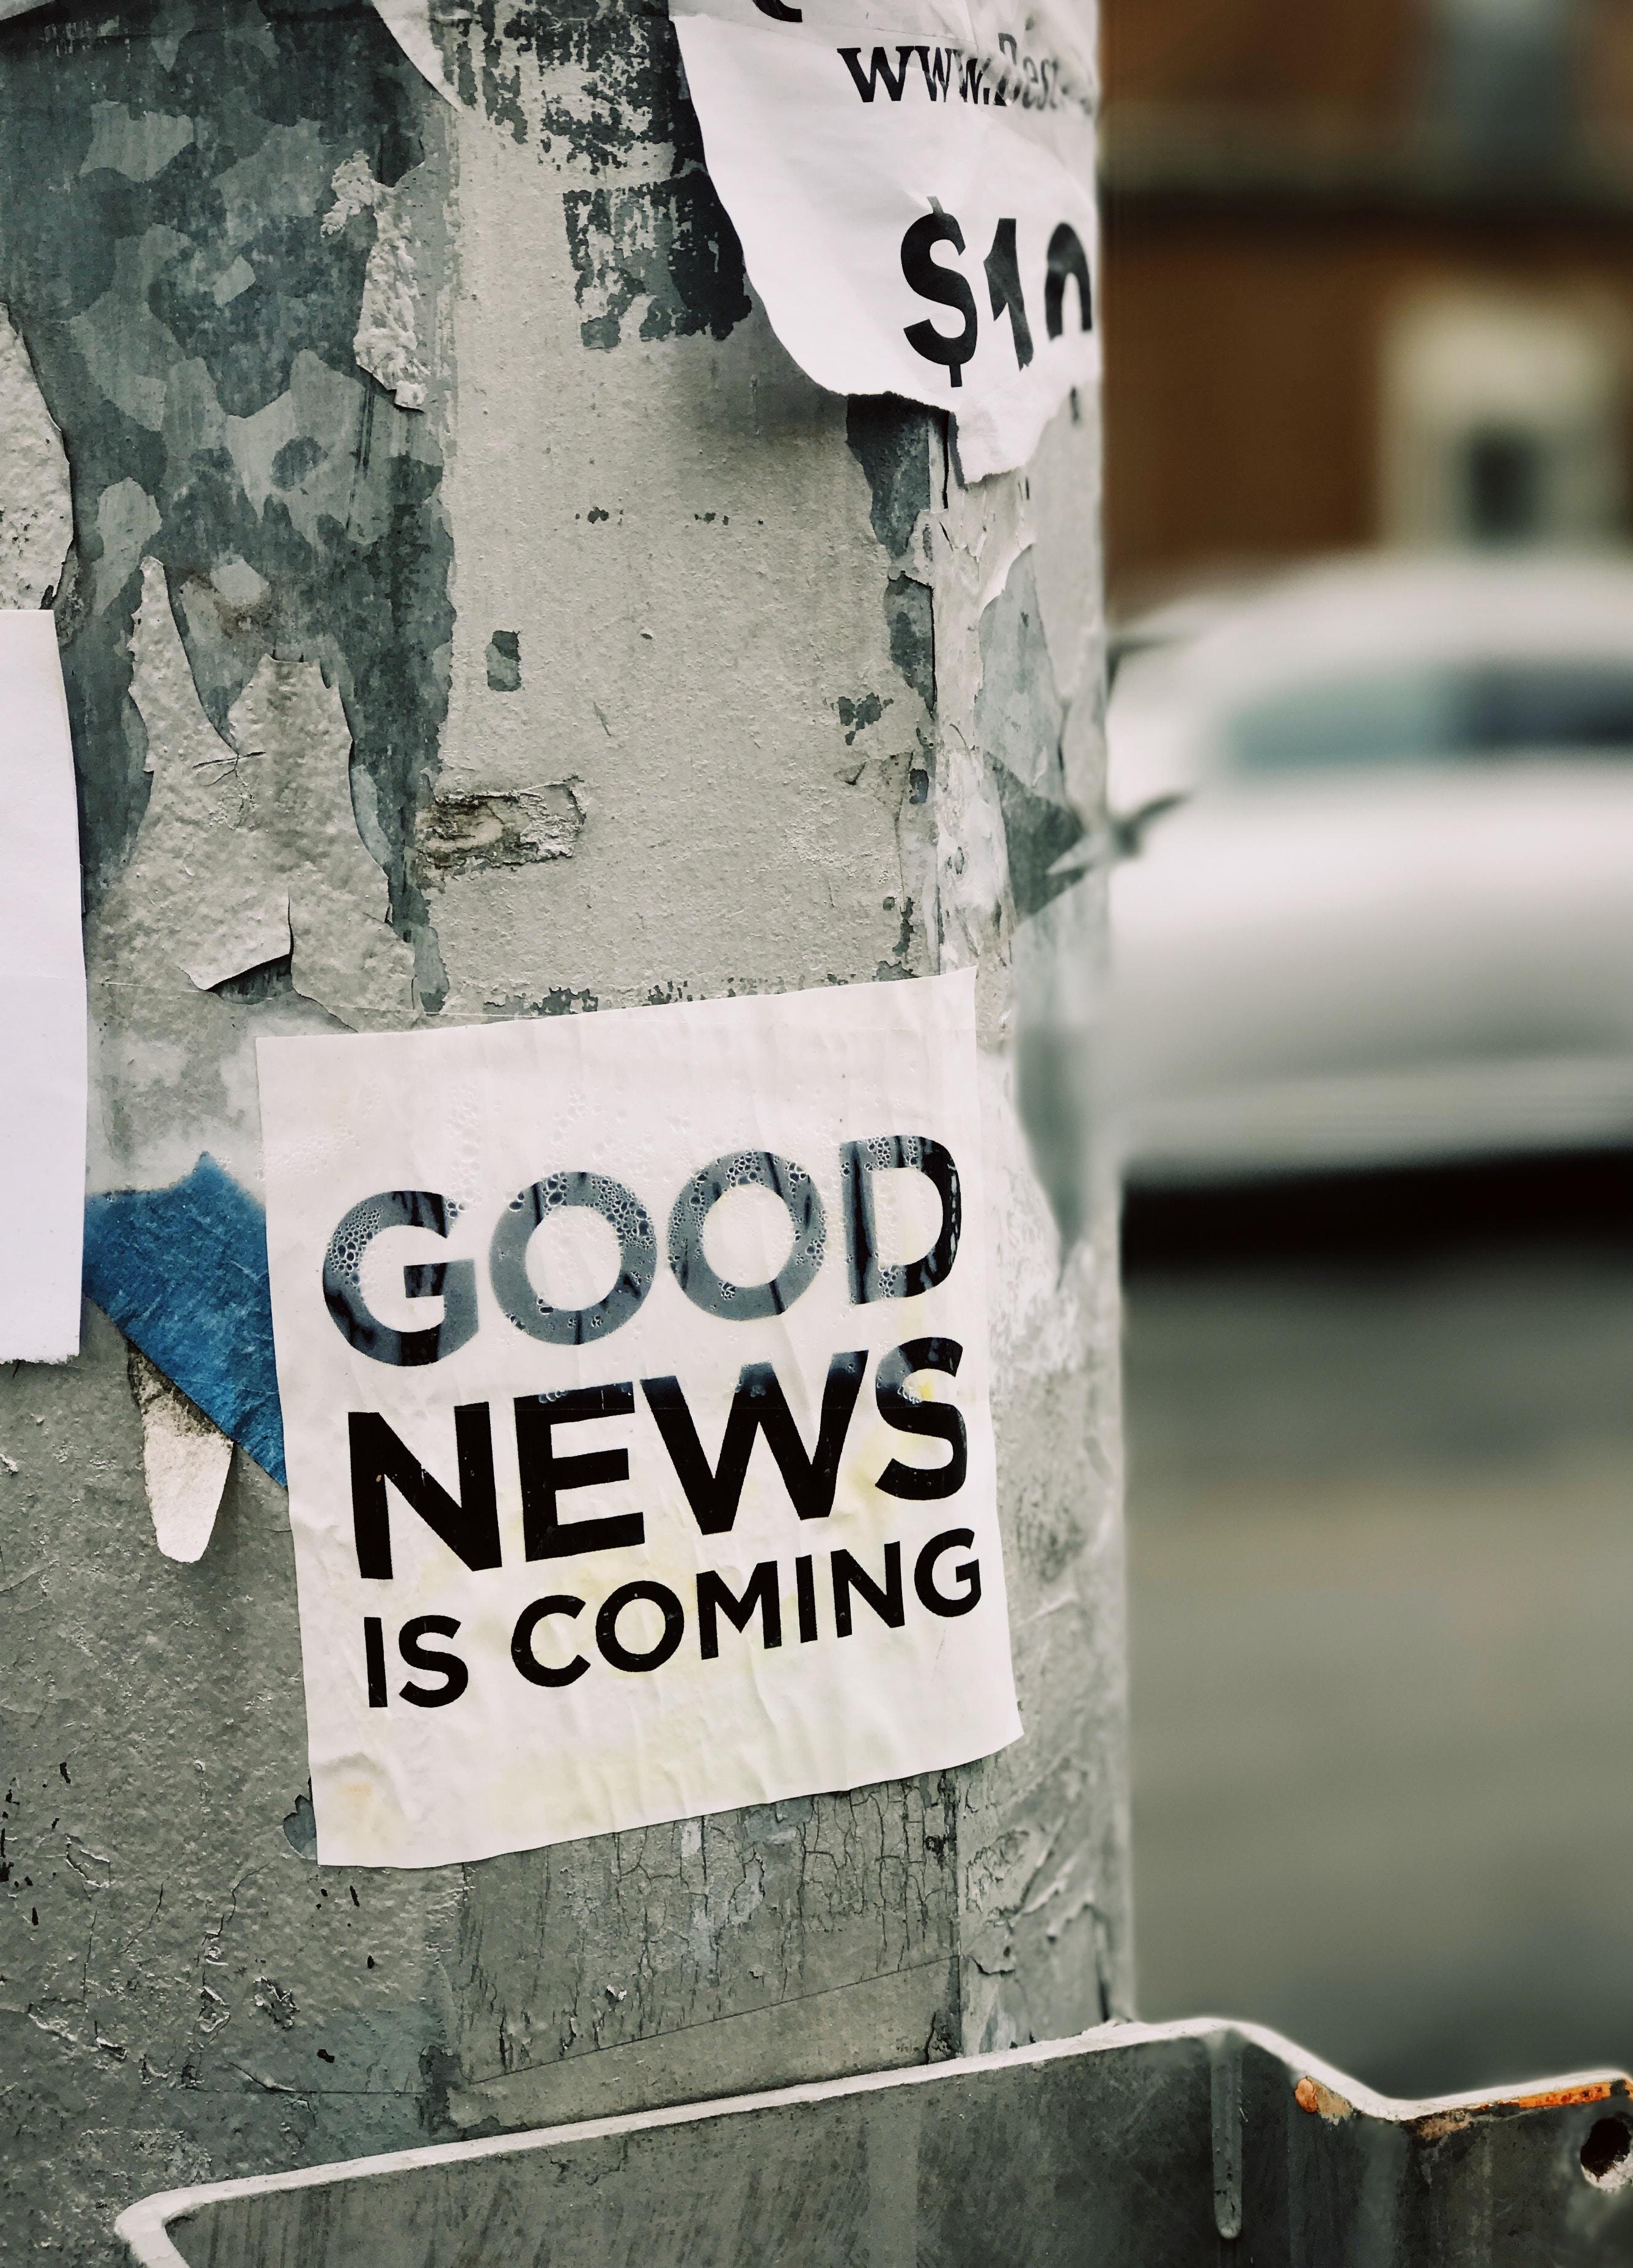 Gyan News